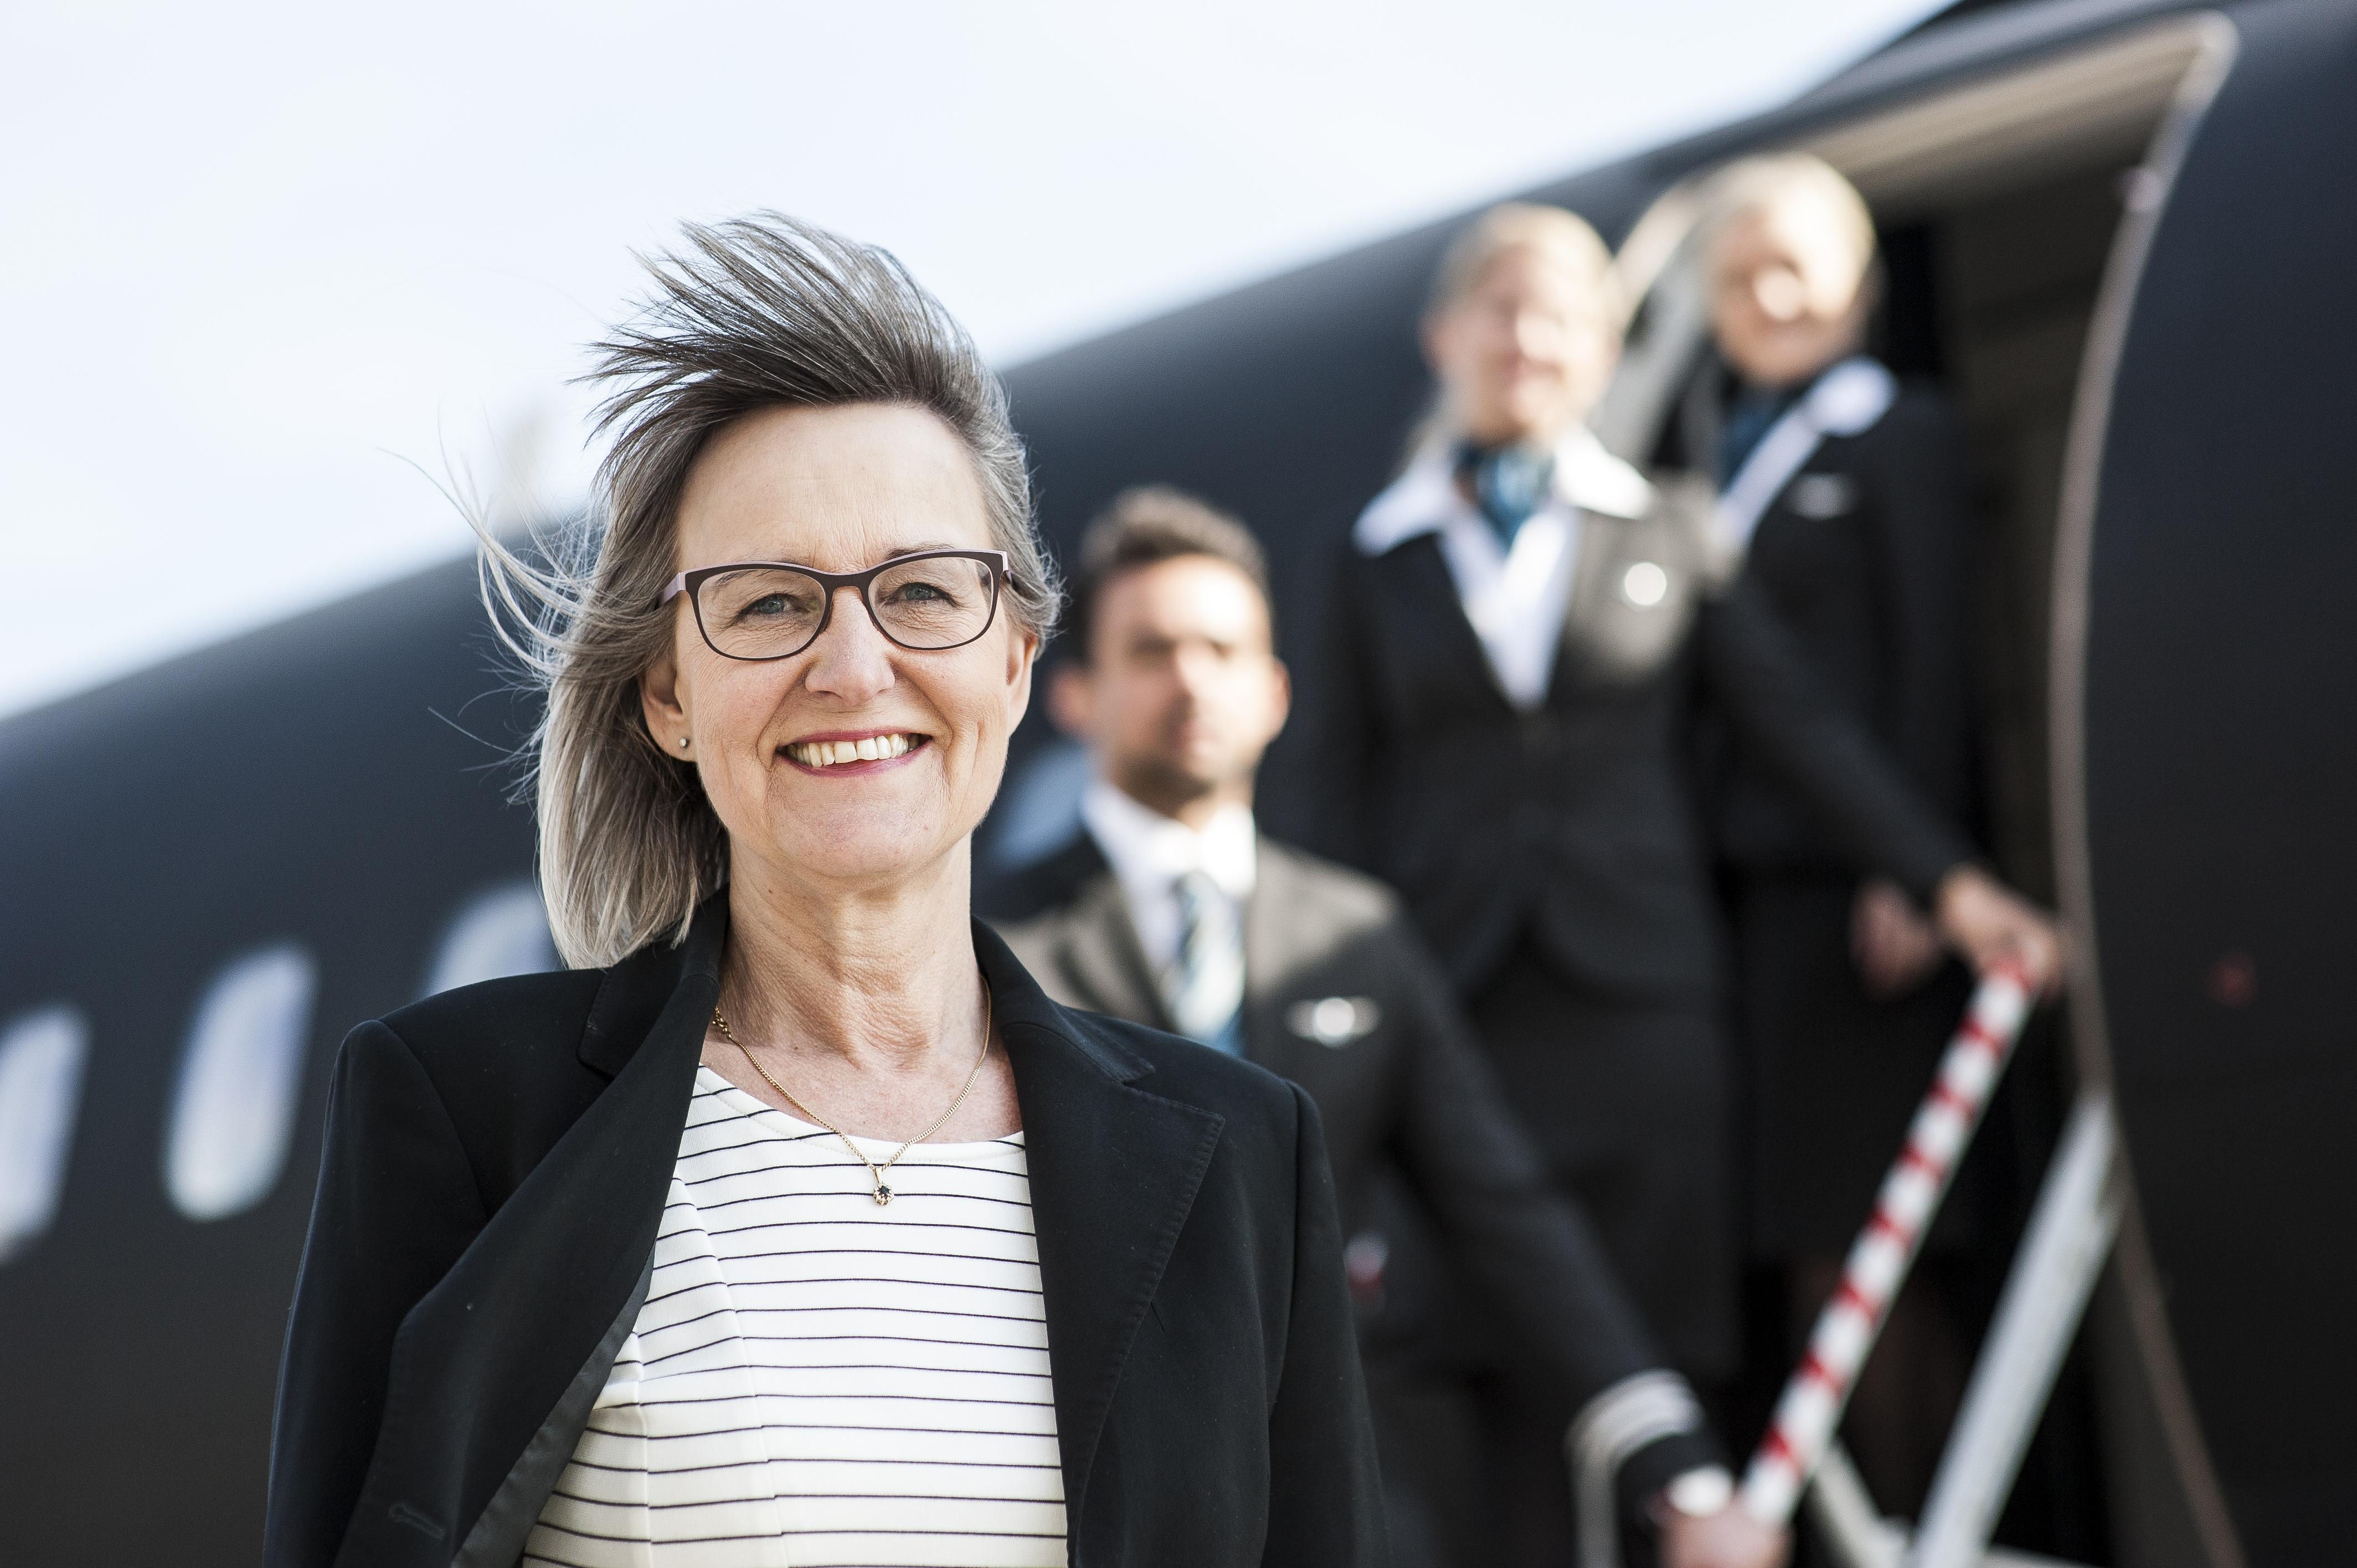 Administrerende direktør Lone Koch fra Alsie Express. (Foto: Alsie Express)